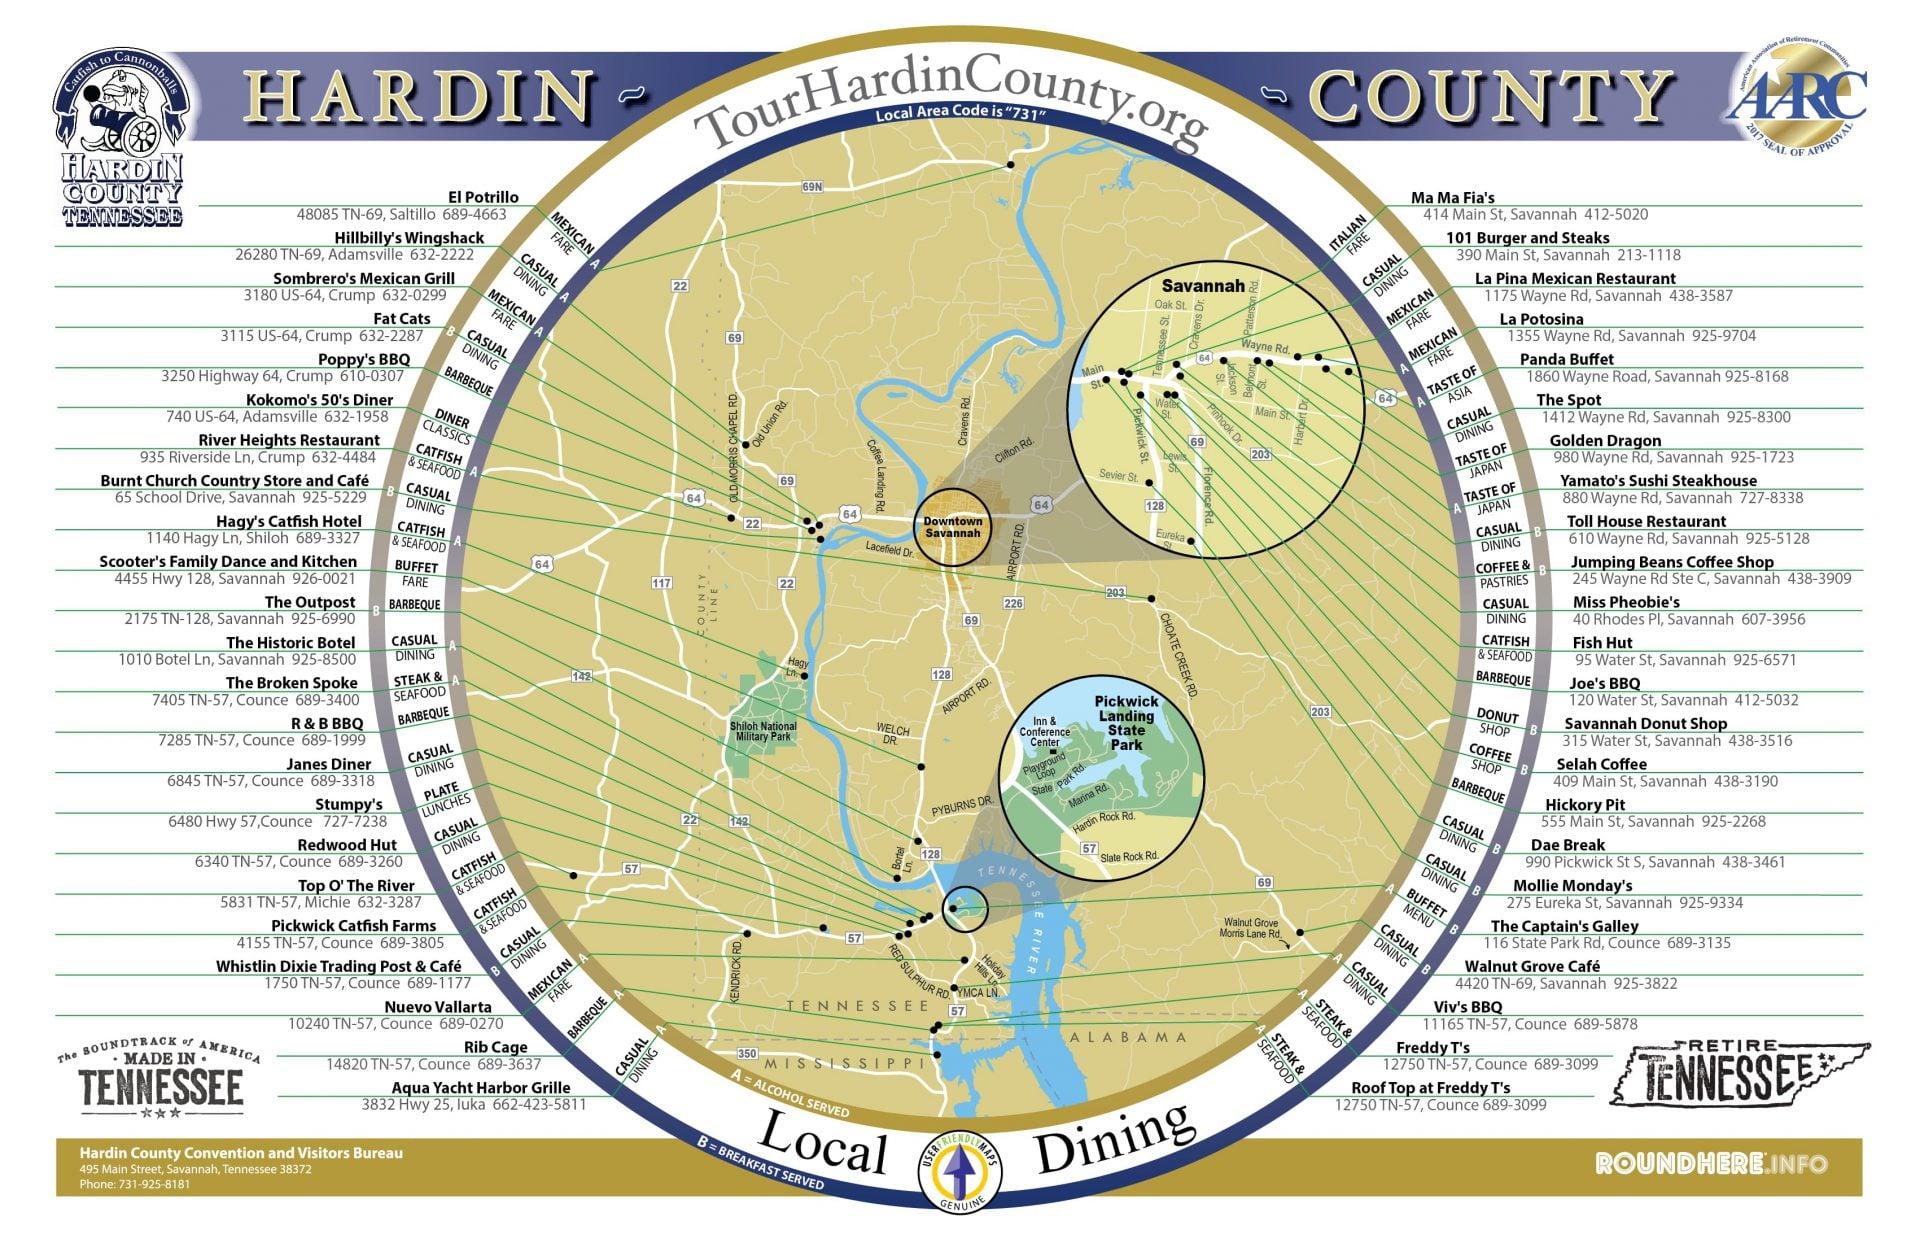 Hardin County RoundHere